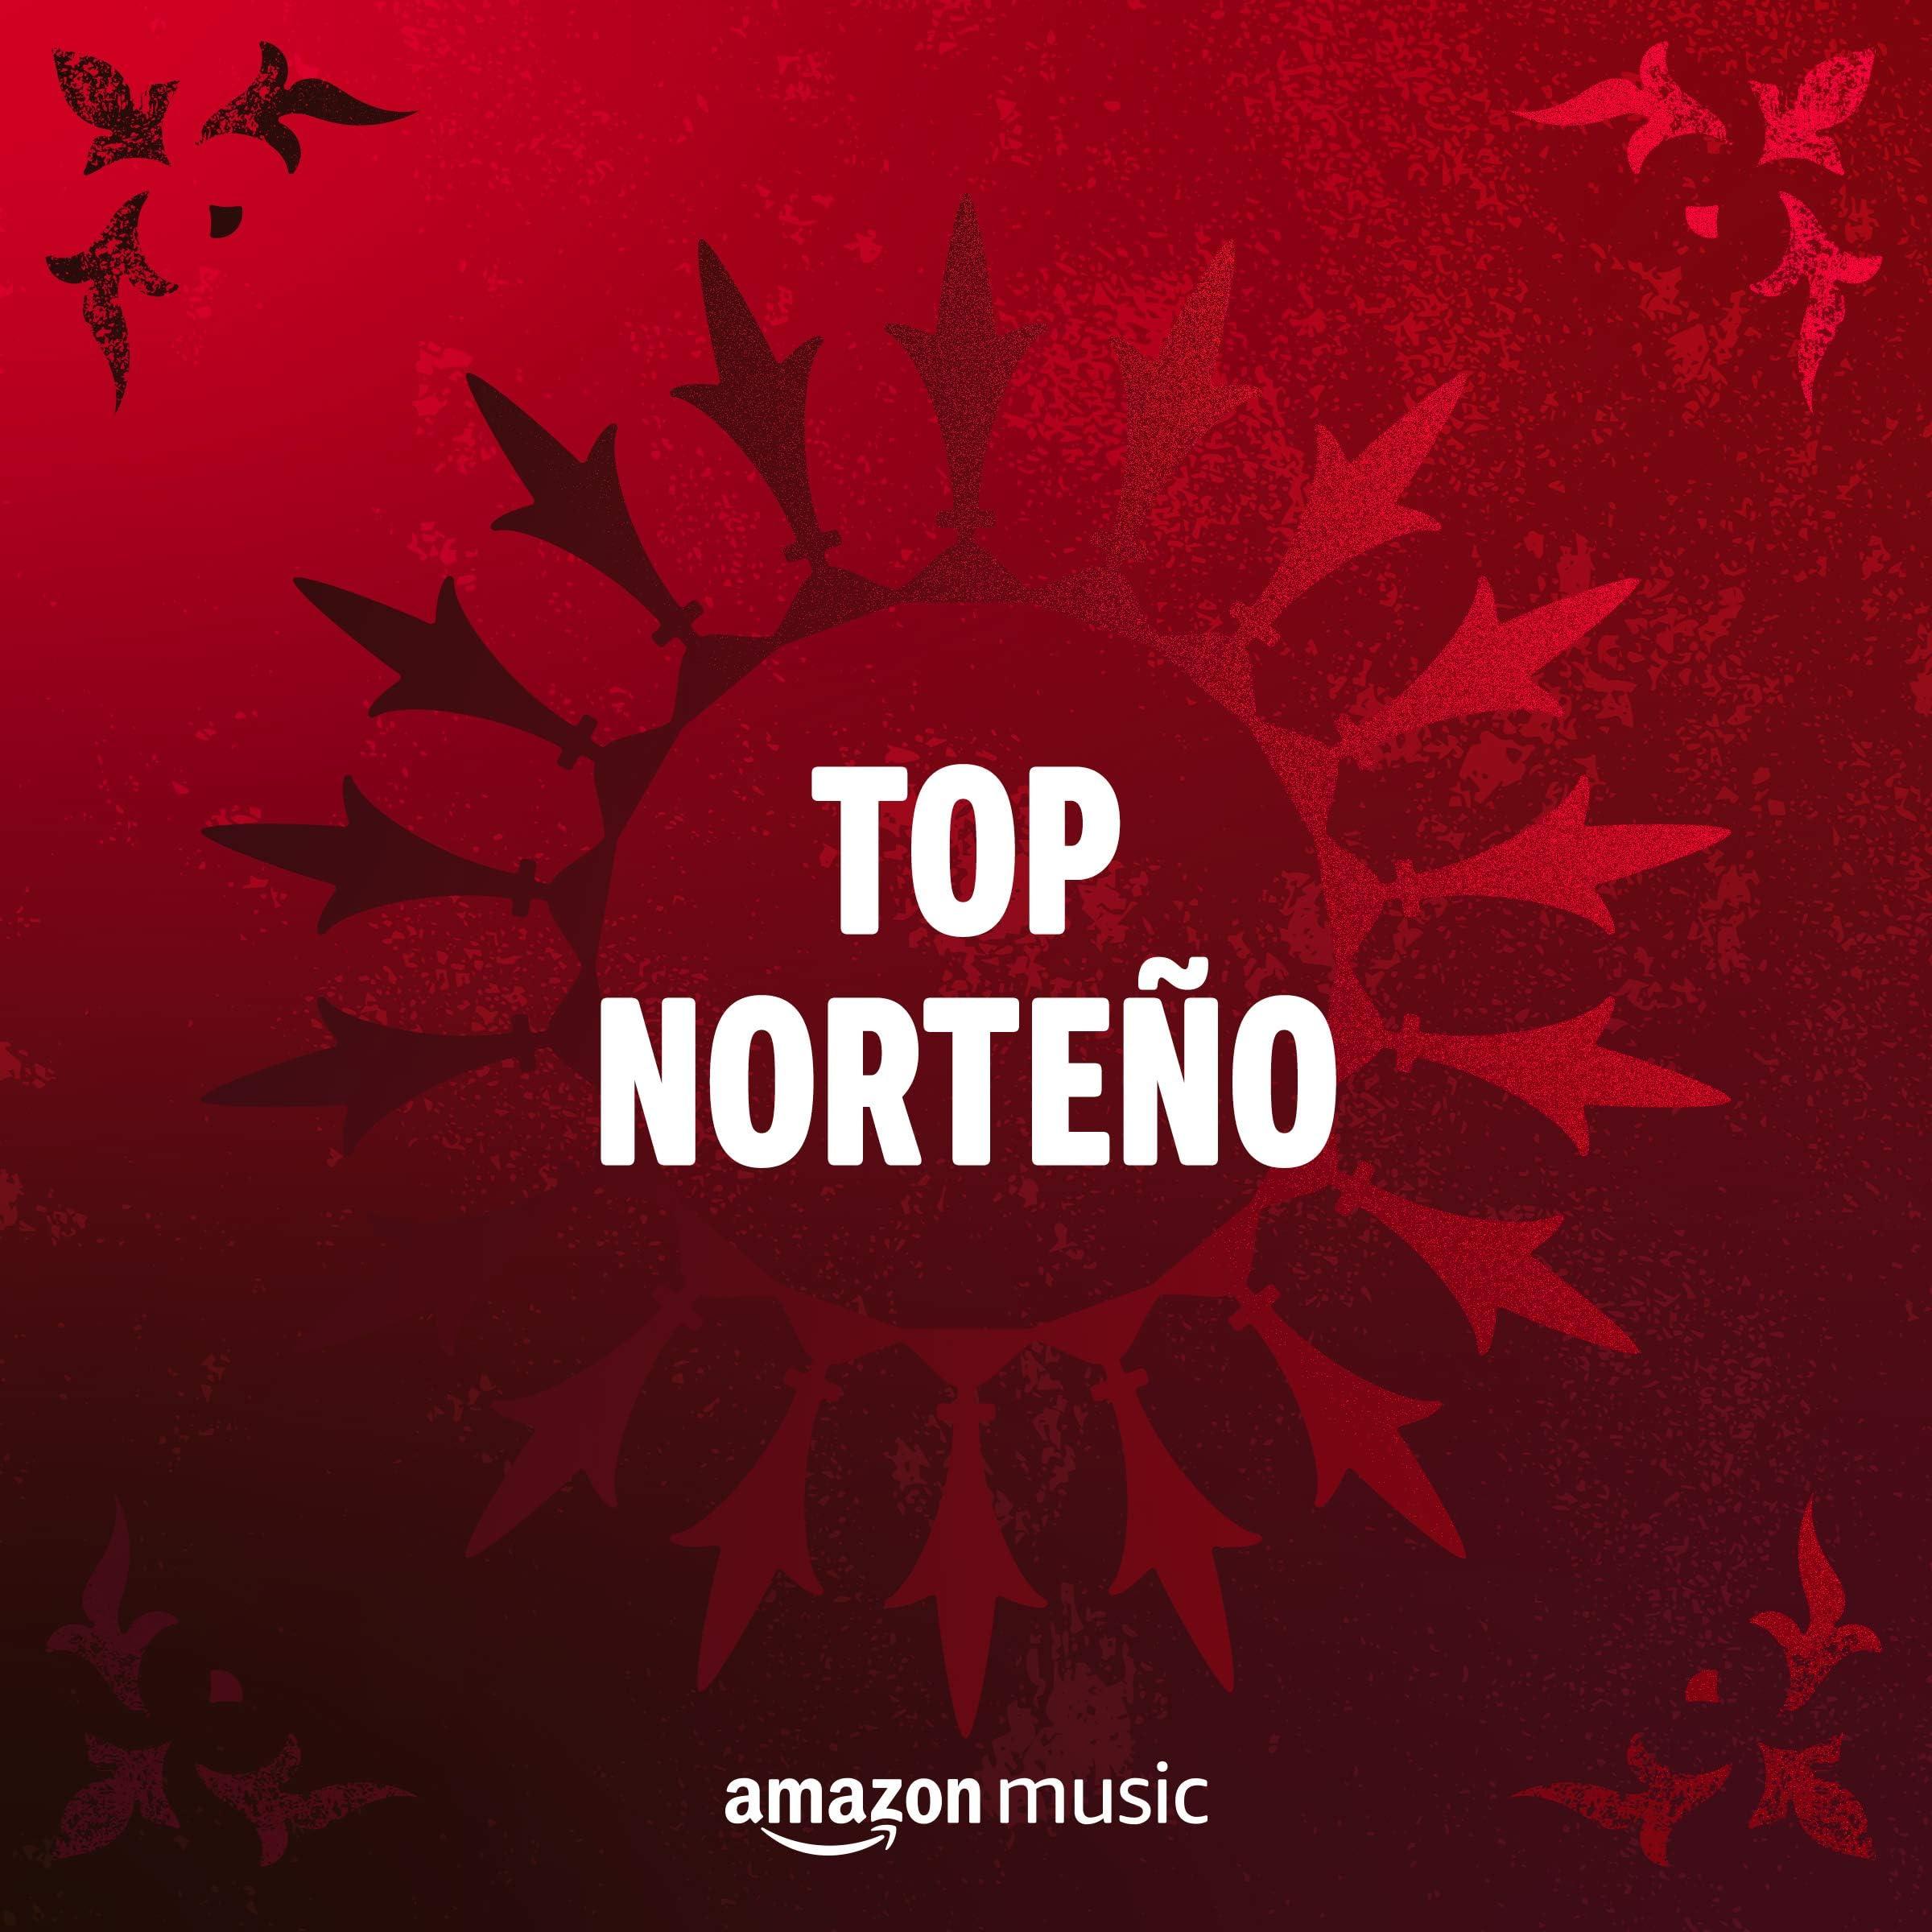 Top Norteño